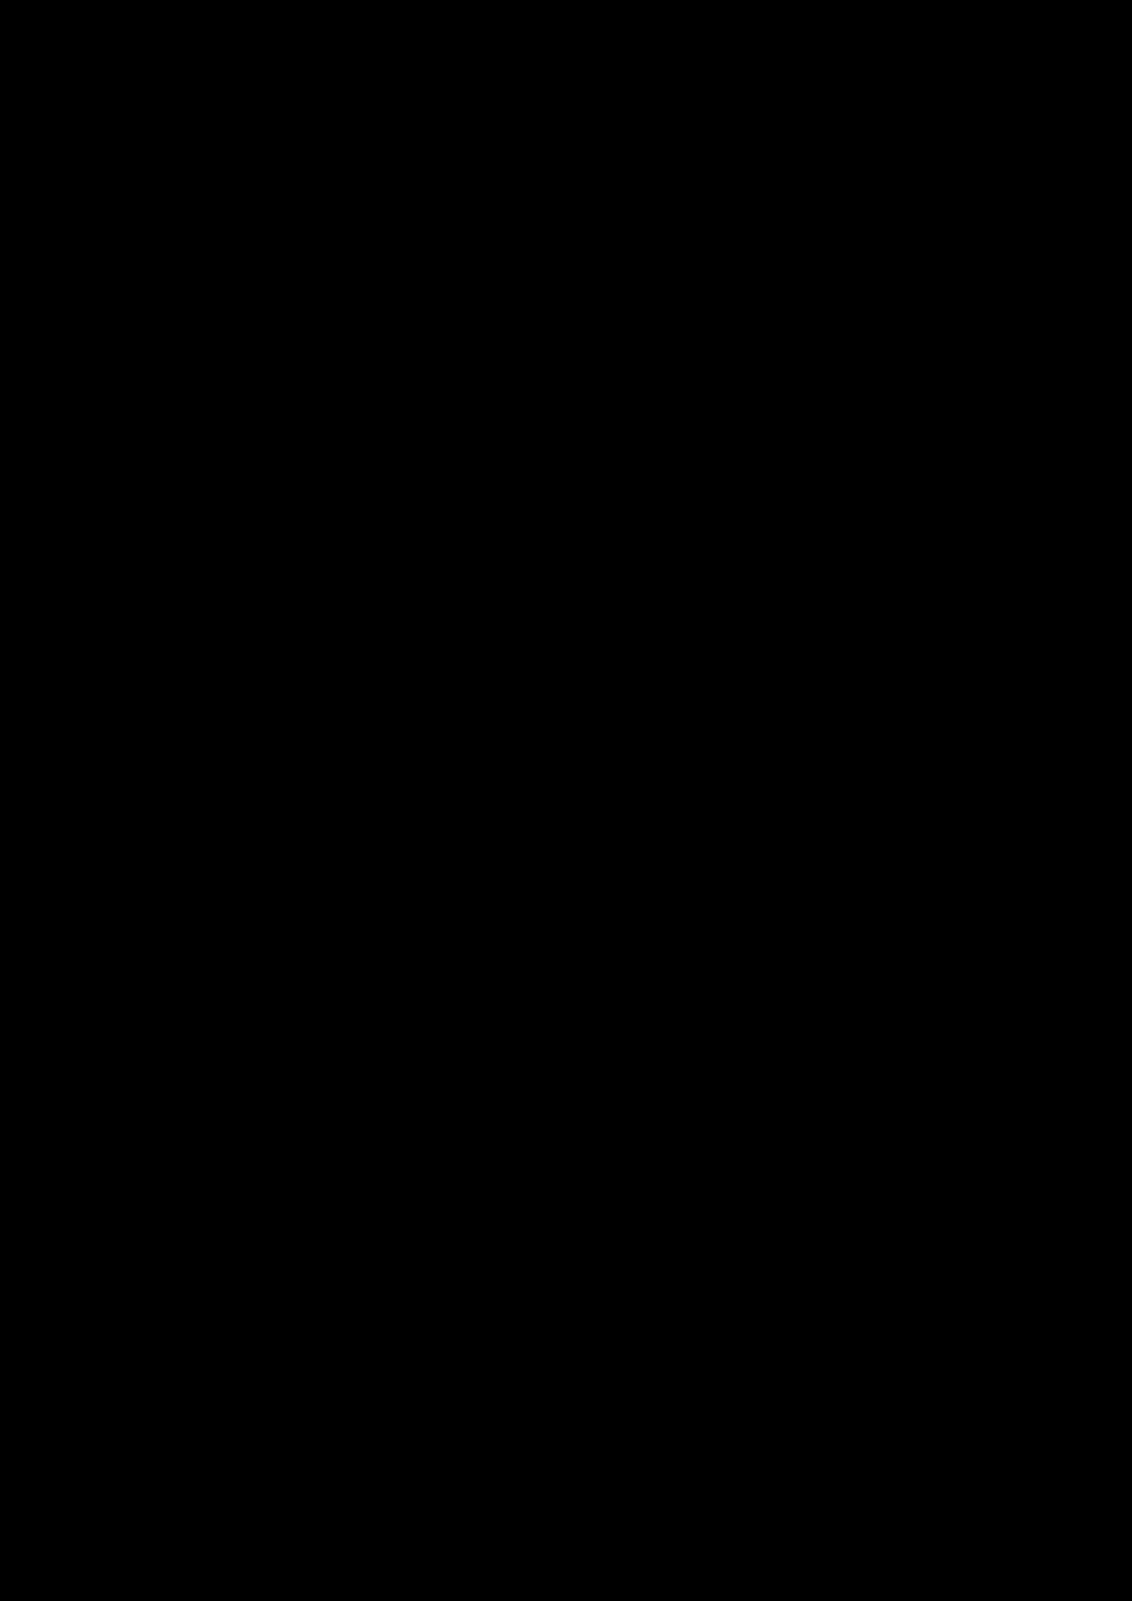 Korolevstvo slez slide, Image 40